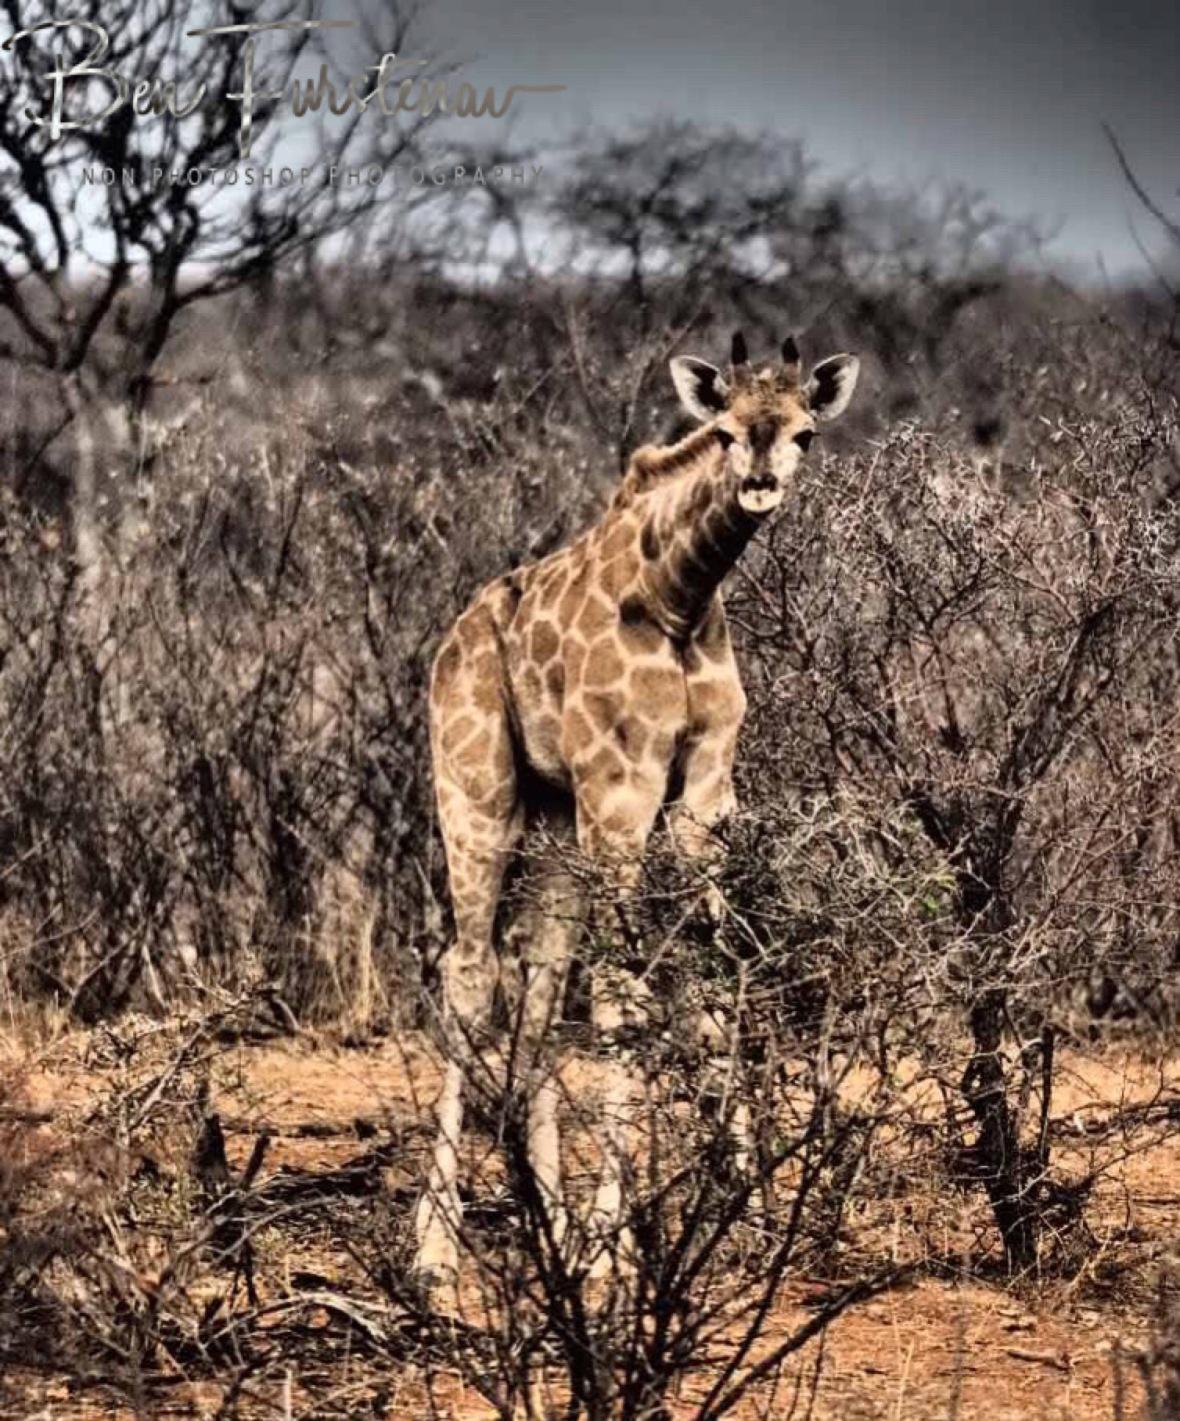 Giraffe curious looks, Sophienhof, Outjo, Namibia